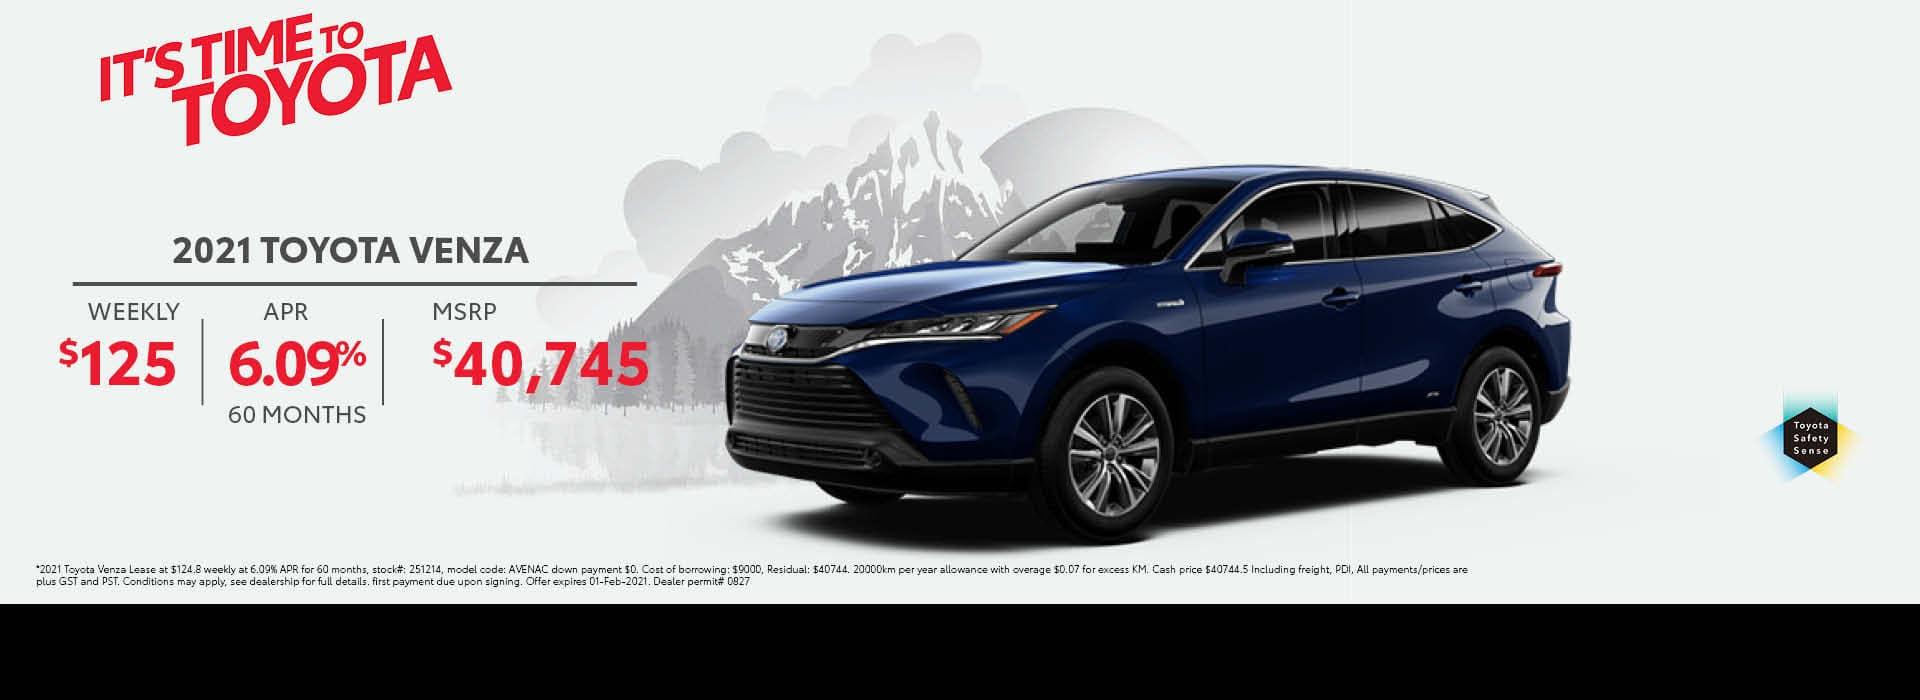 2021_Toyota_Venza_Desktop_Jan2021